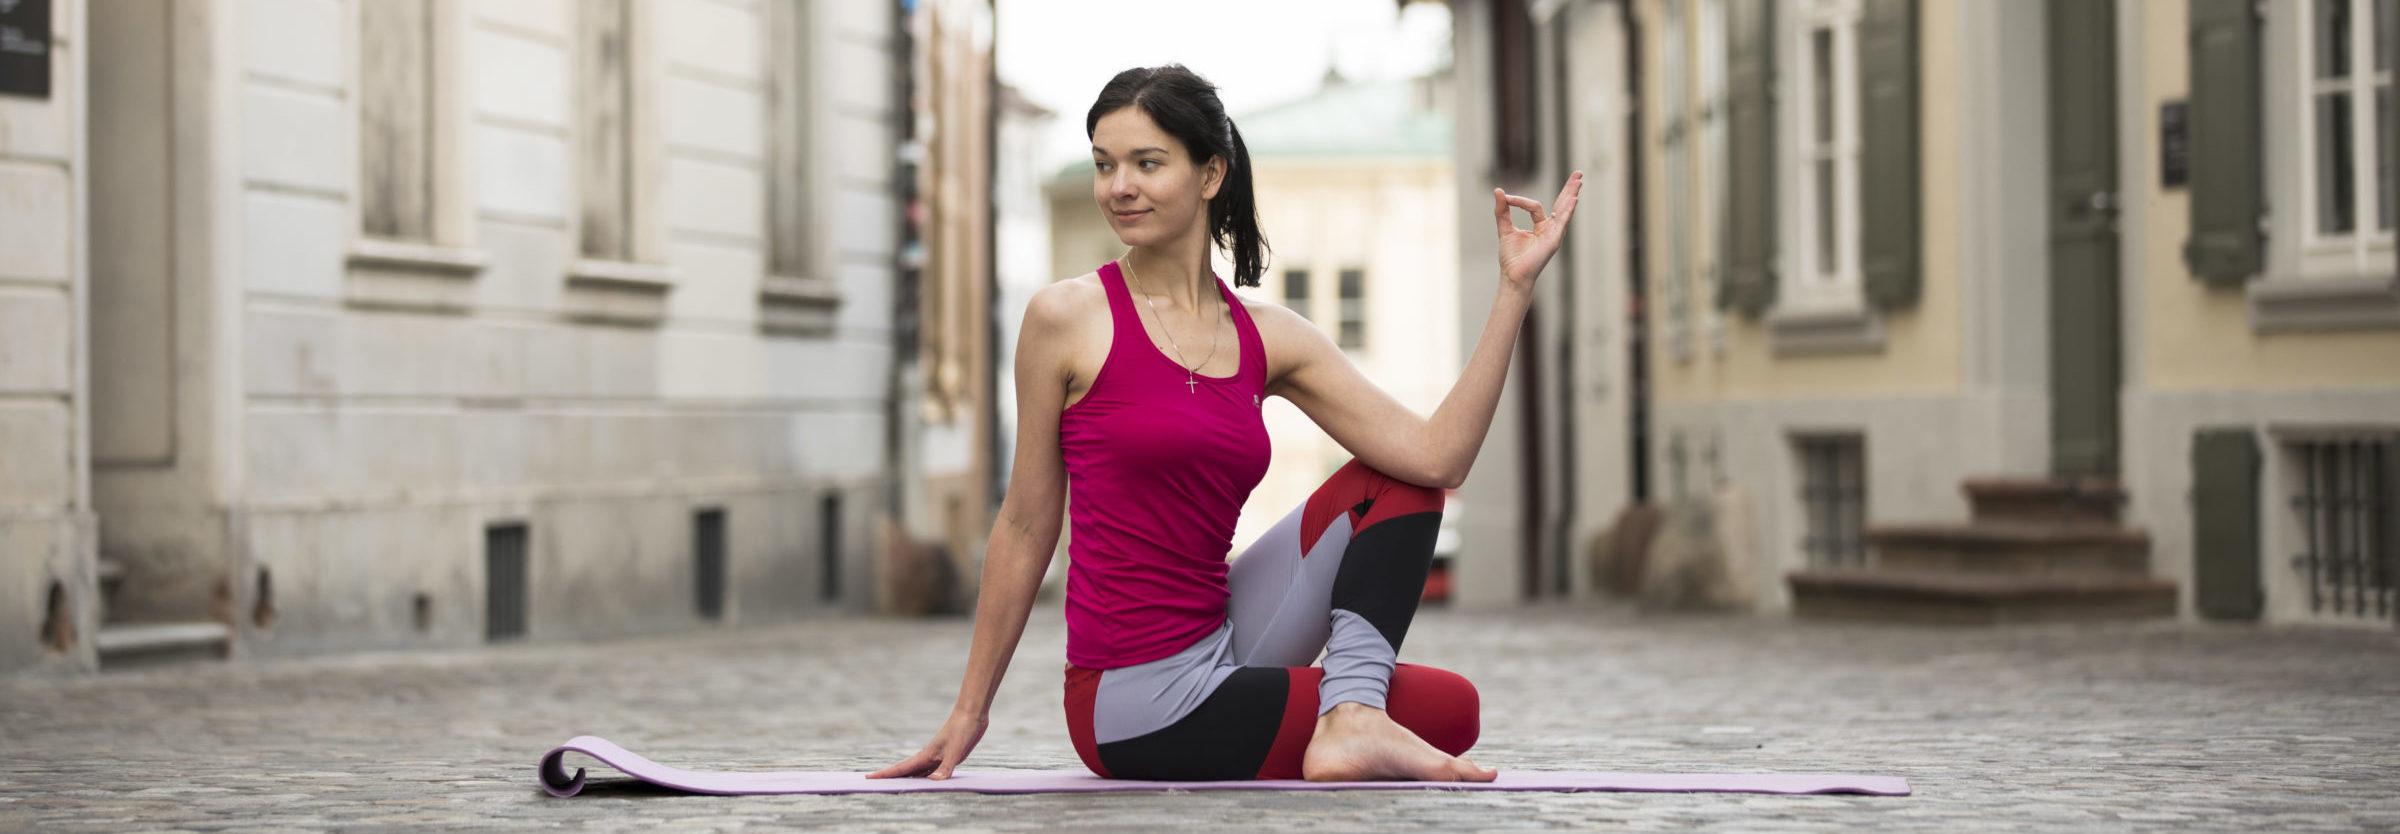 Elad Itzkin Yoga Photography - karyna meier ELAD9808